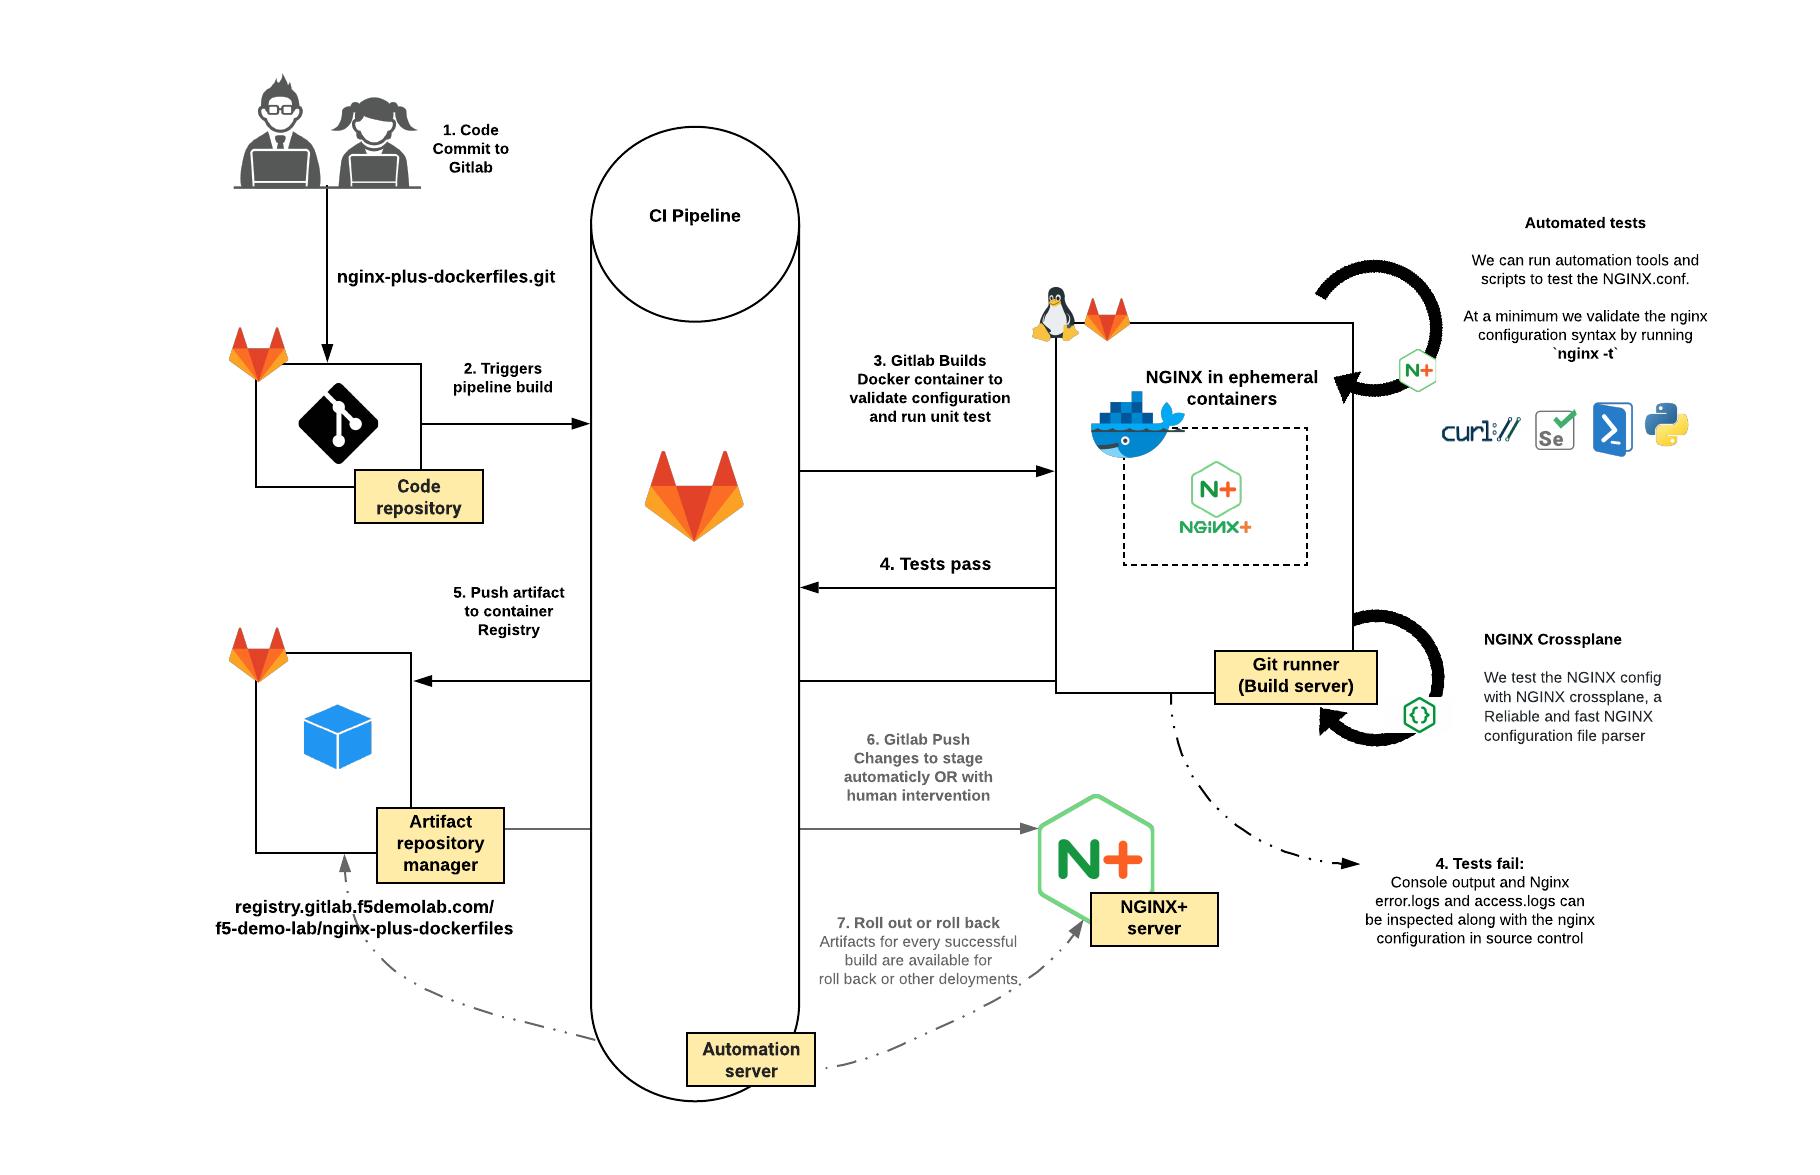 Module 20 Creating docker images for NGINX Plus